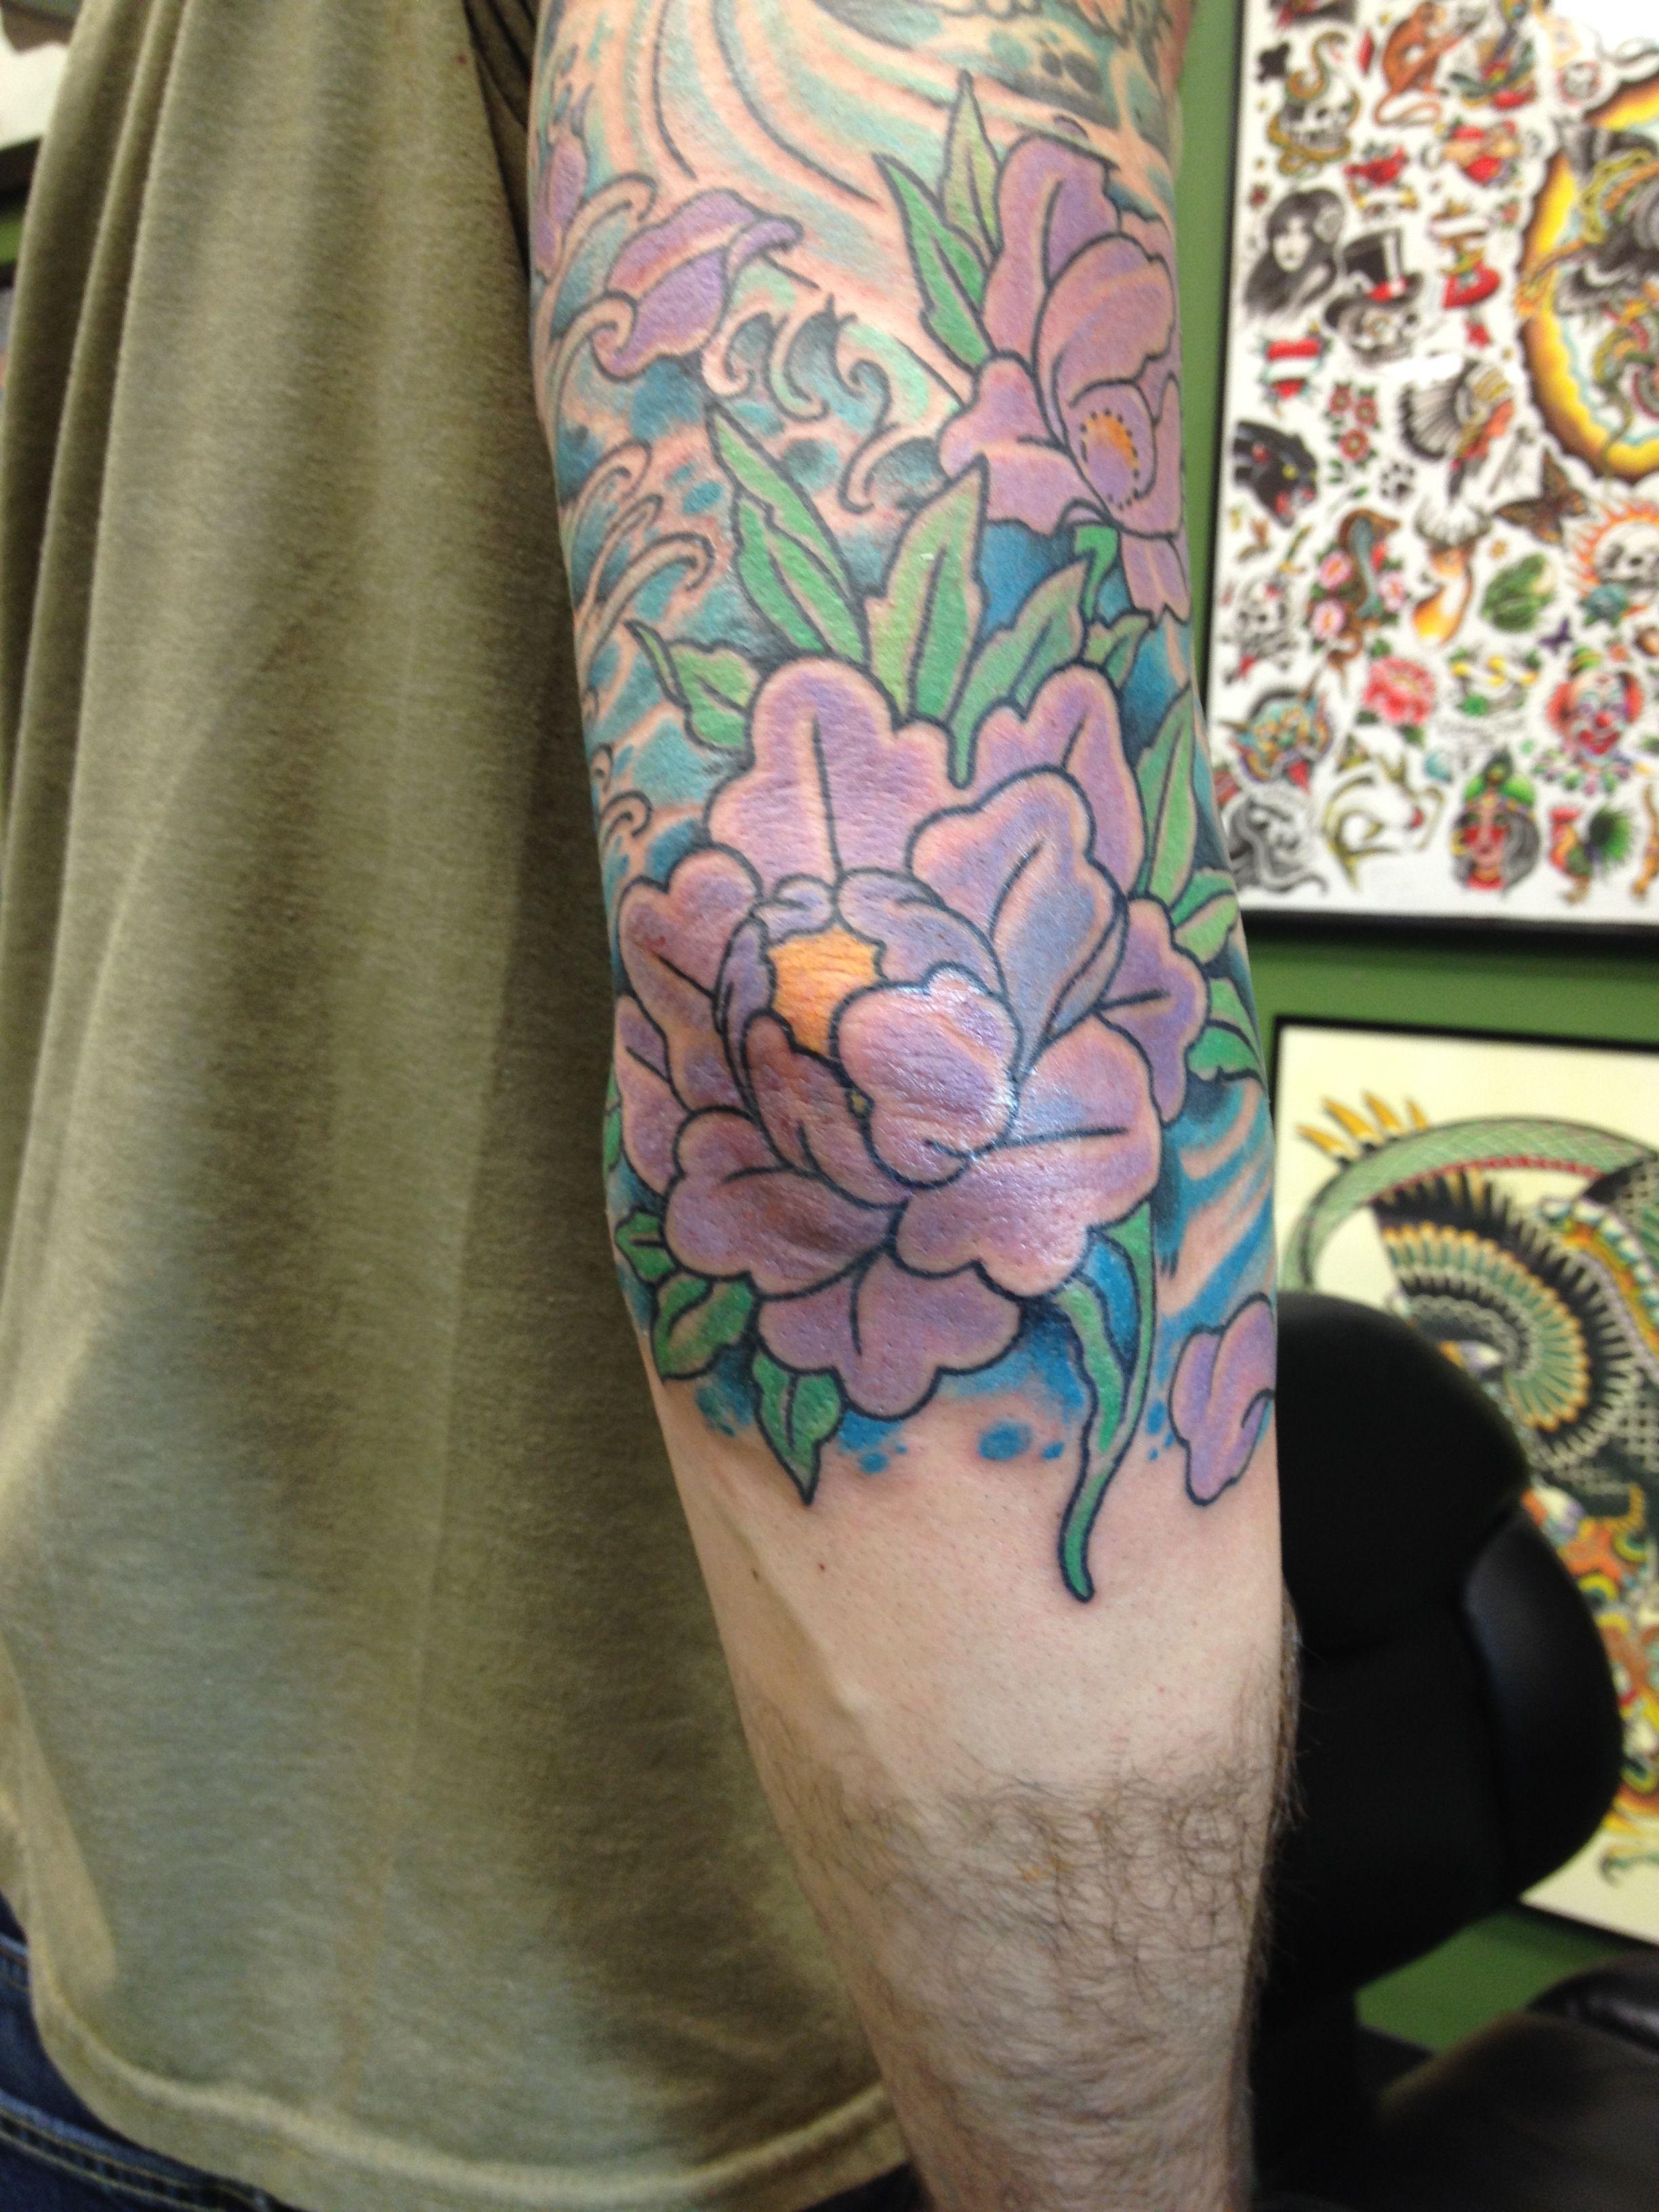 Peony flower tattoo on elbow elbow tattoos pinterest elbow peony flower tattoo on elbow peony flower tattoos elbow tattoos lotus tattoo izmirmasajfo